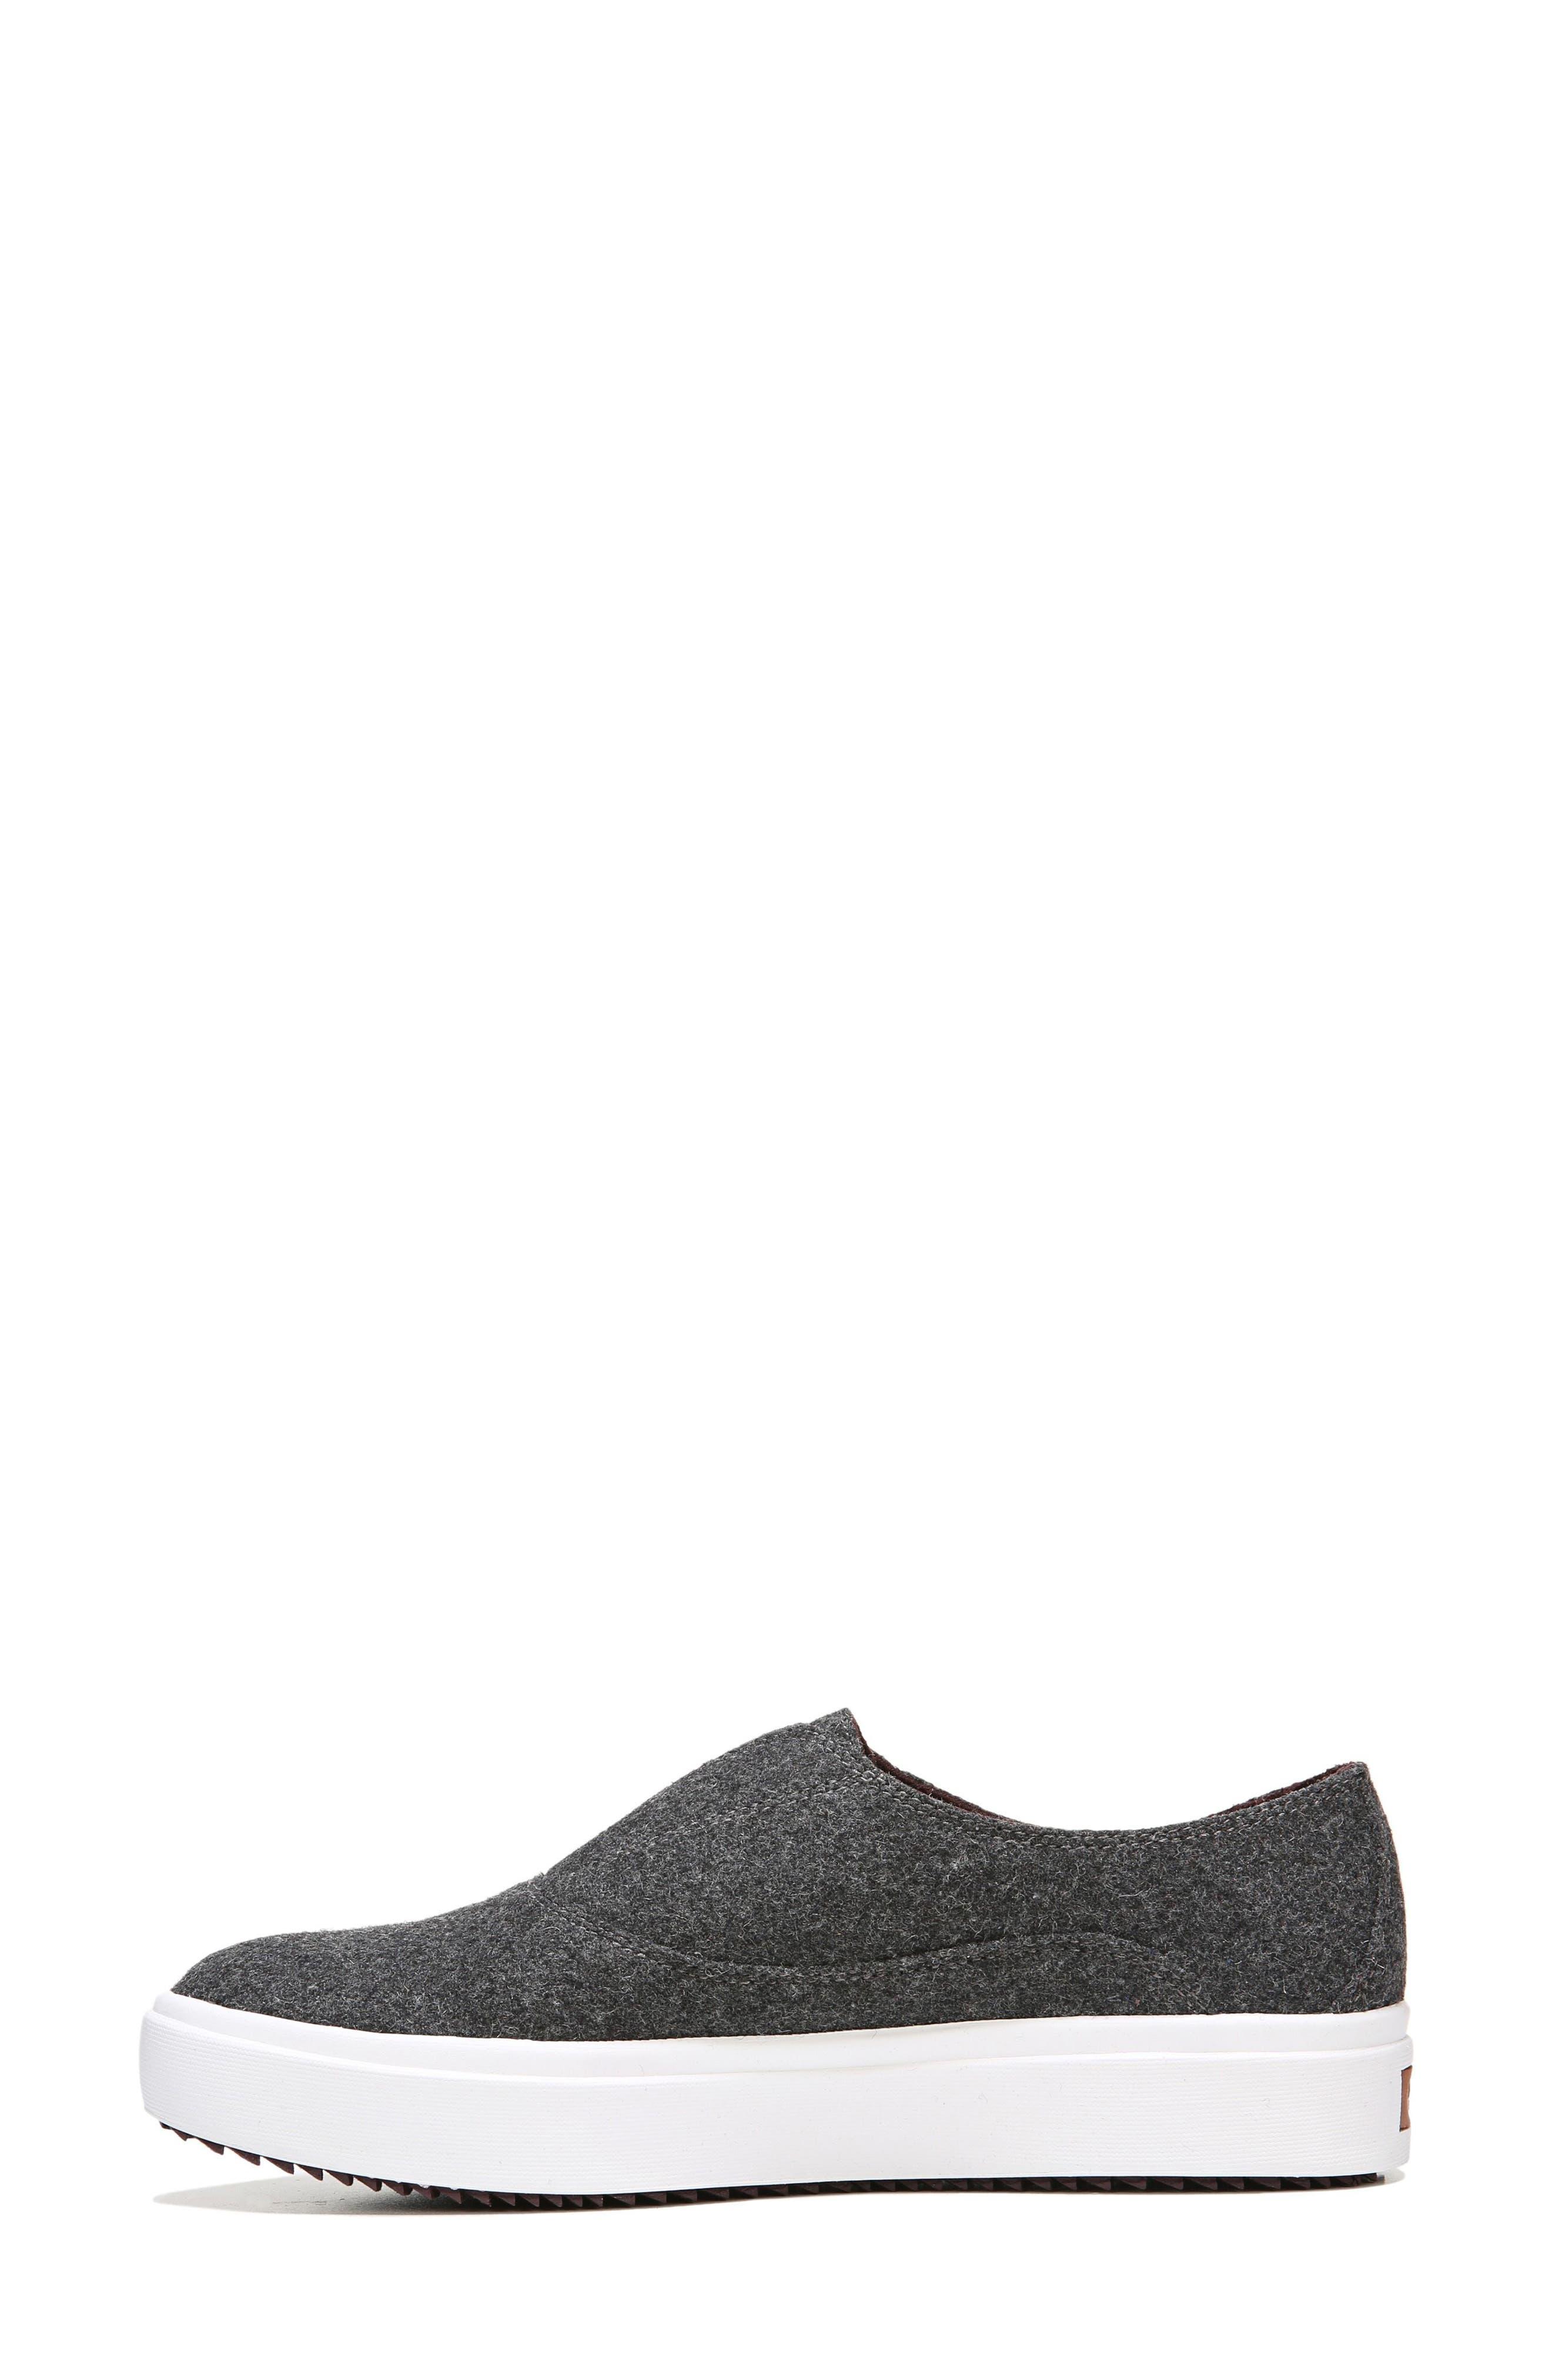 Alternate Image 2  - Dr. Scholl's Brey Slip-On Sneaker (Women)